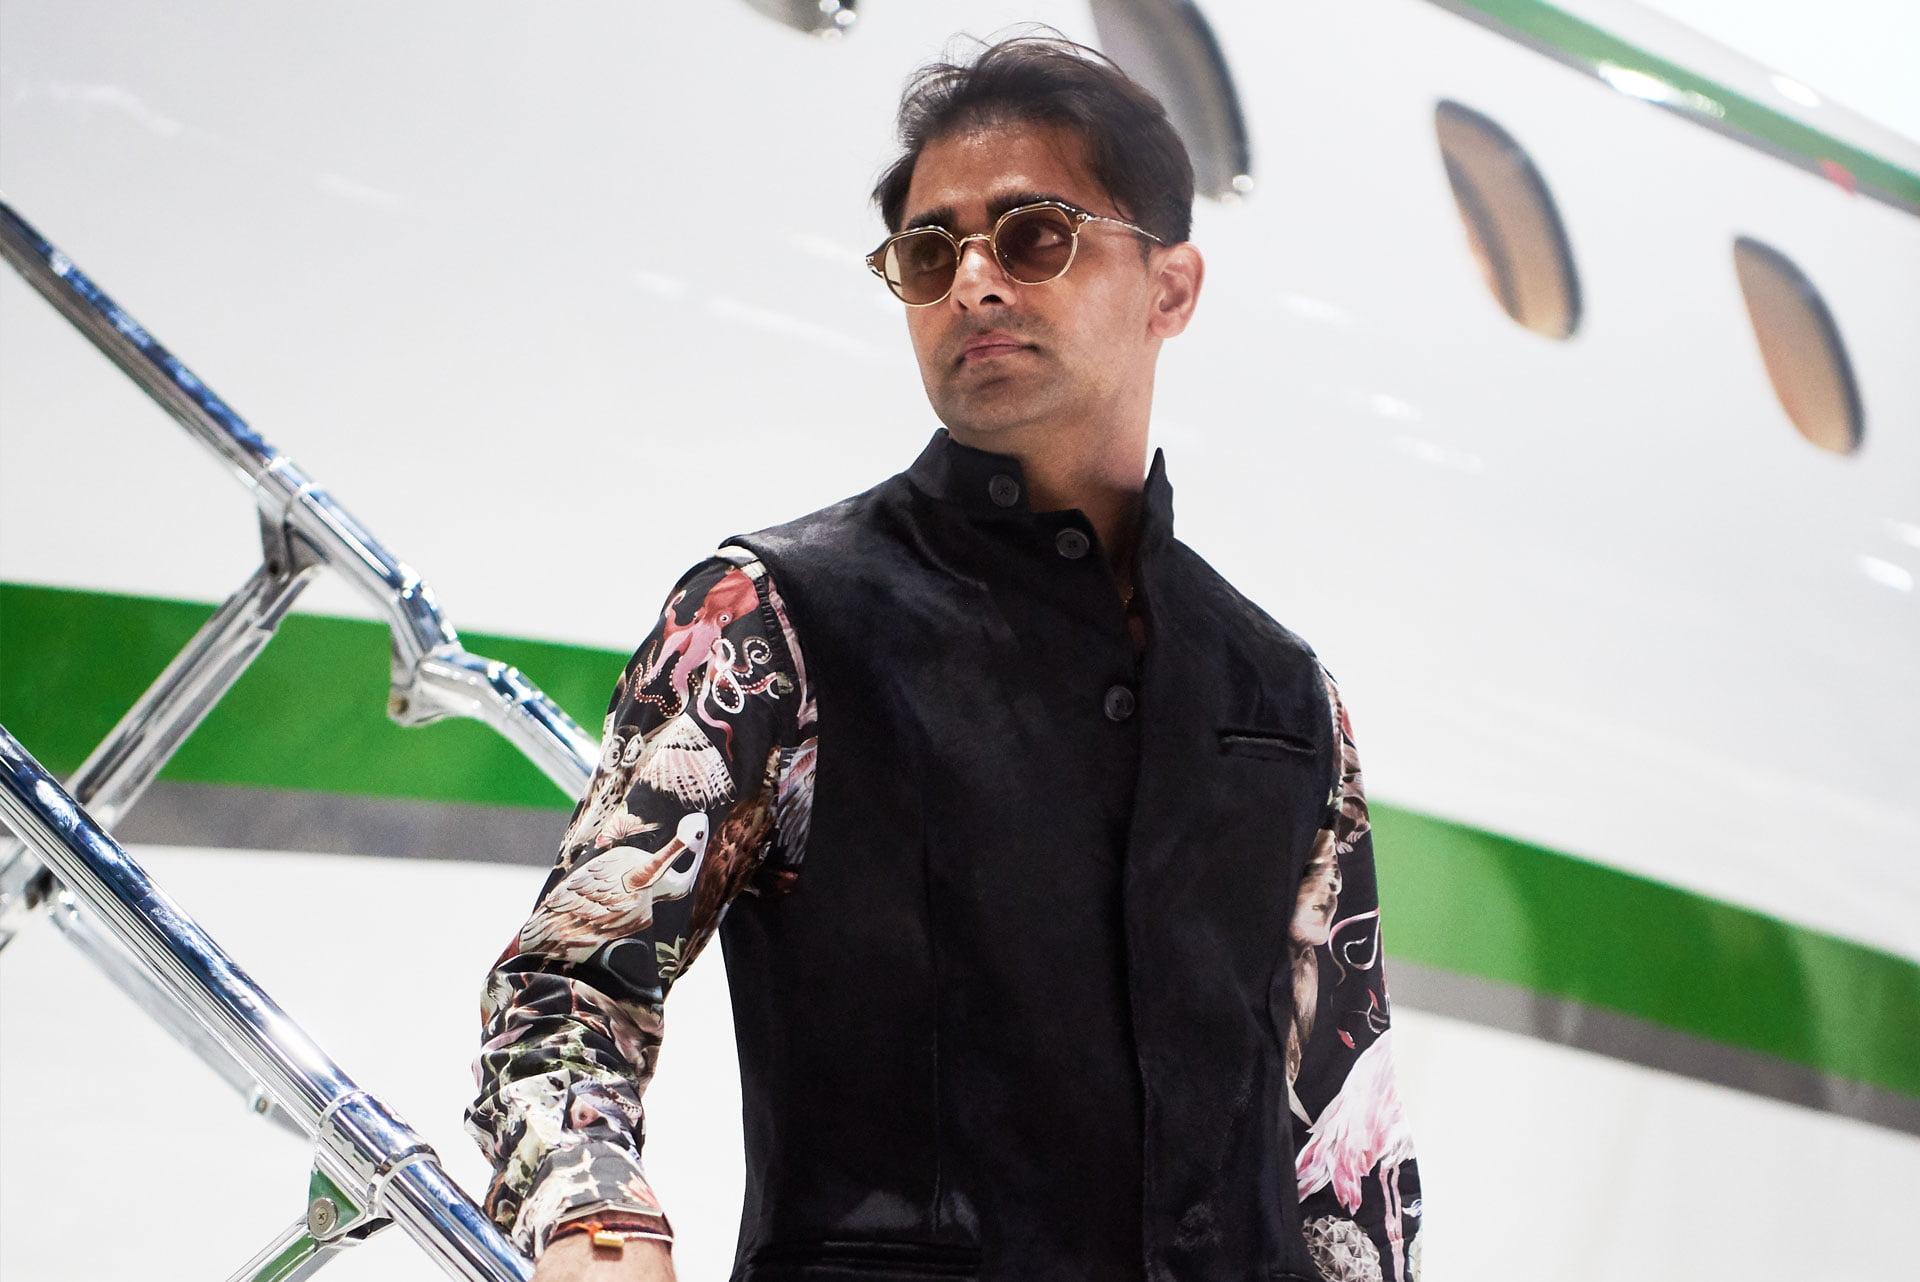 Ameerh-Naran-Vimana-Private-Jets-CEO